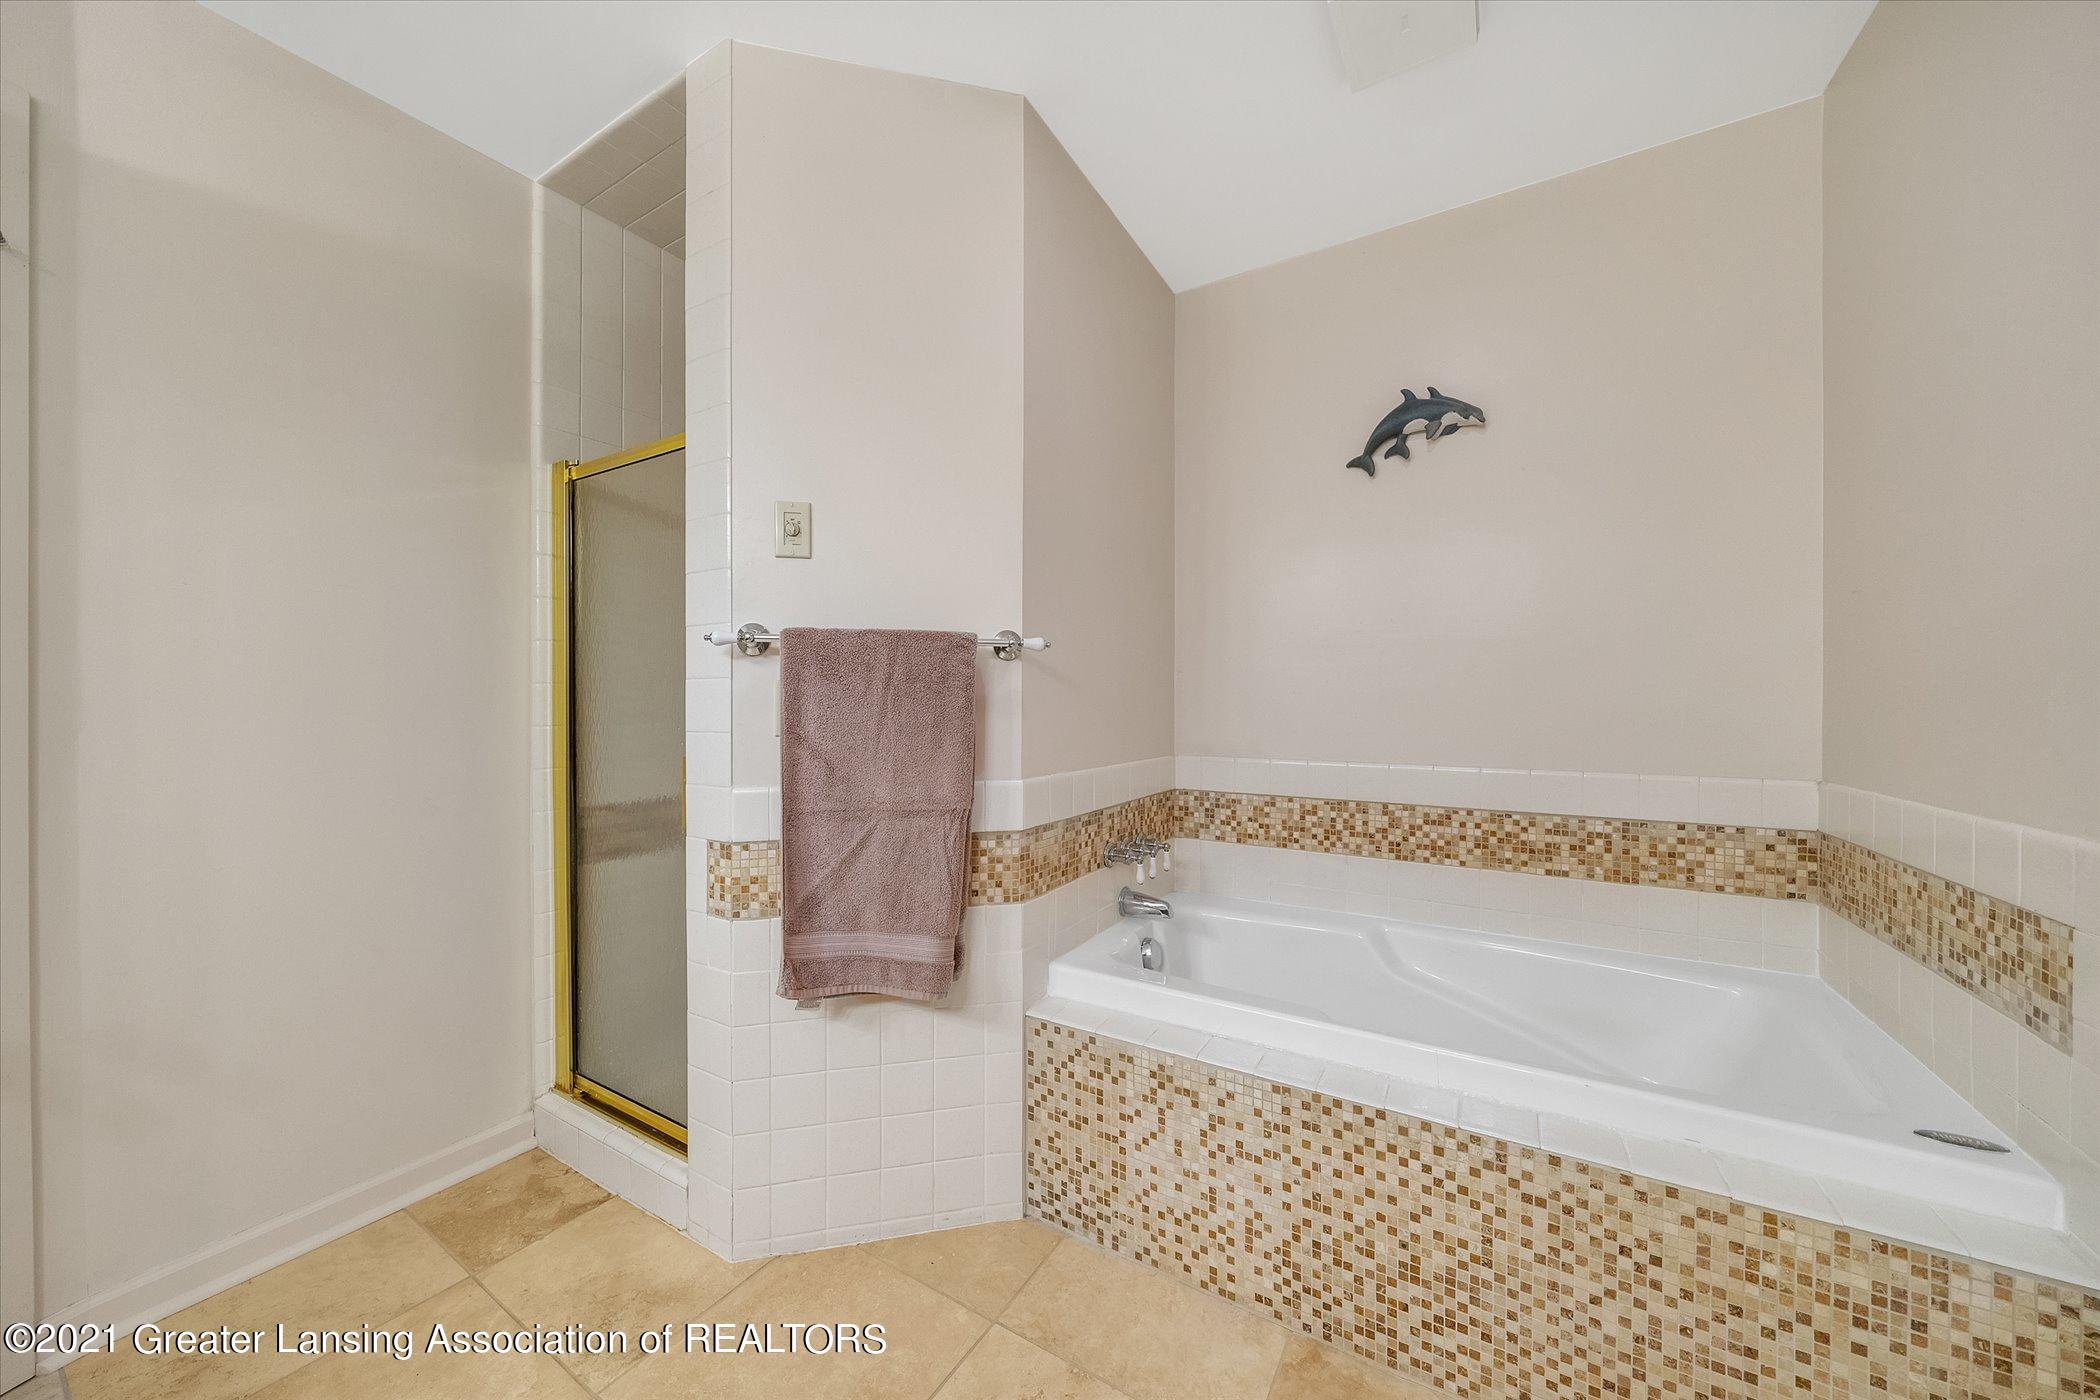 442 Shoesmith Rd - (21) MAIN FLOOR Primary Bathroom - 22